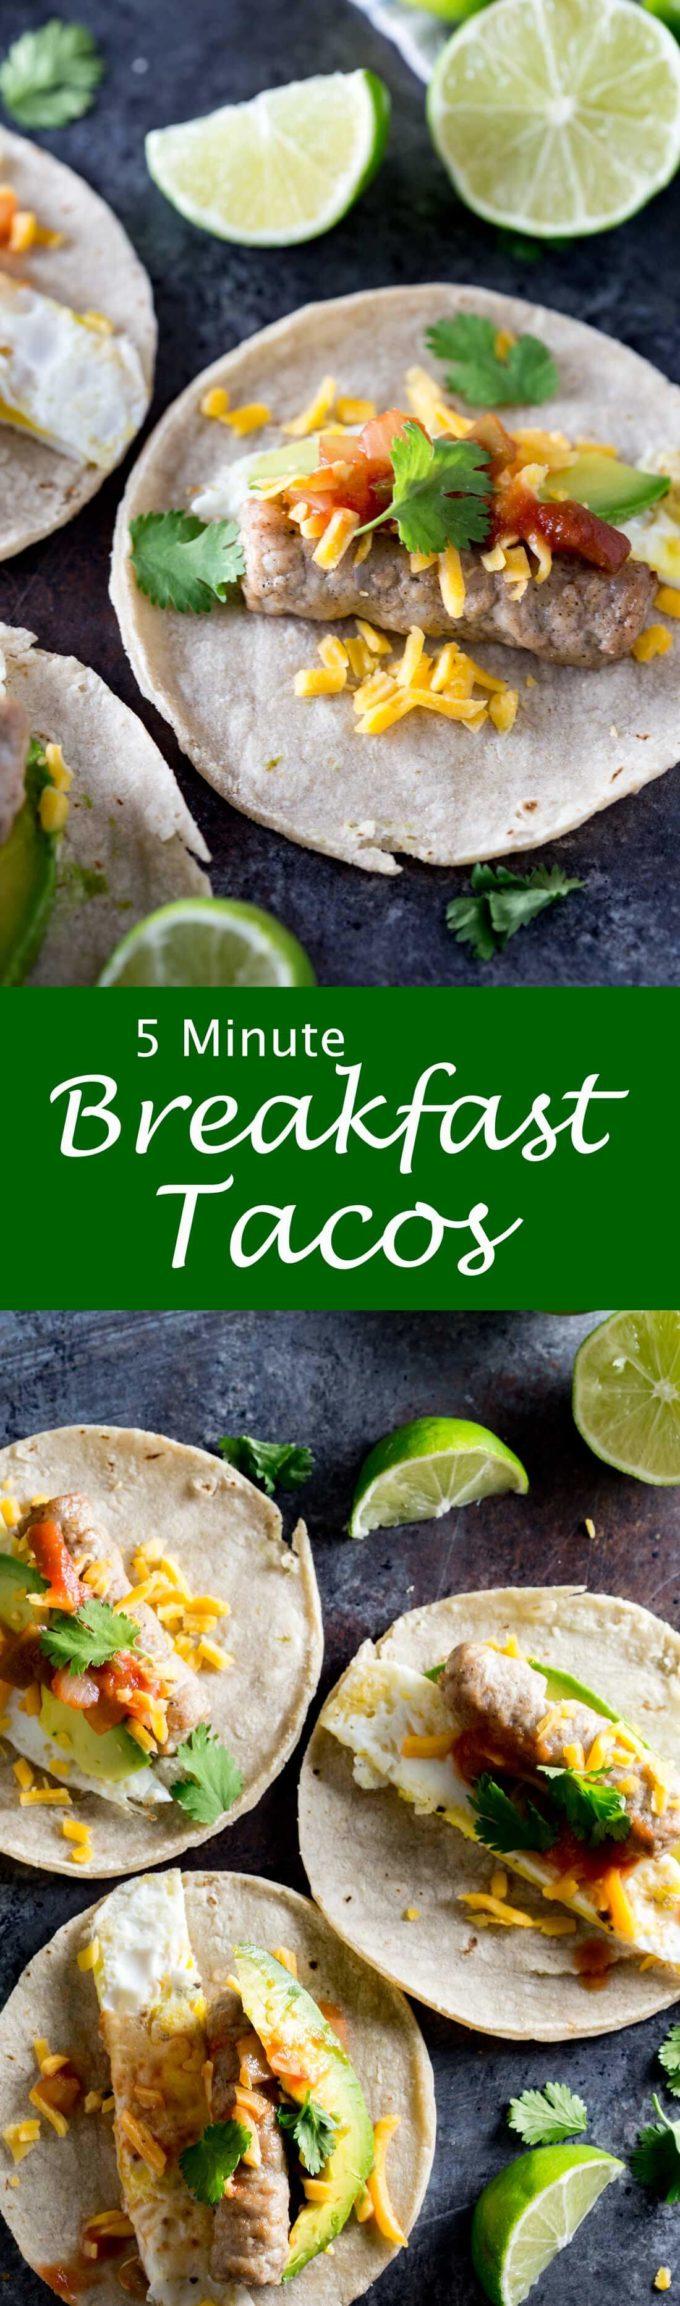 Breakfast-Tacos-PIN-2